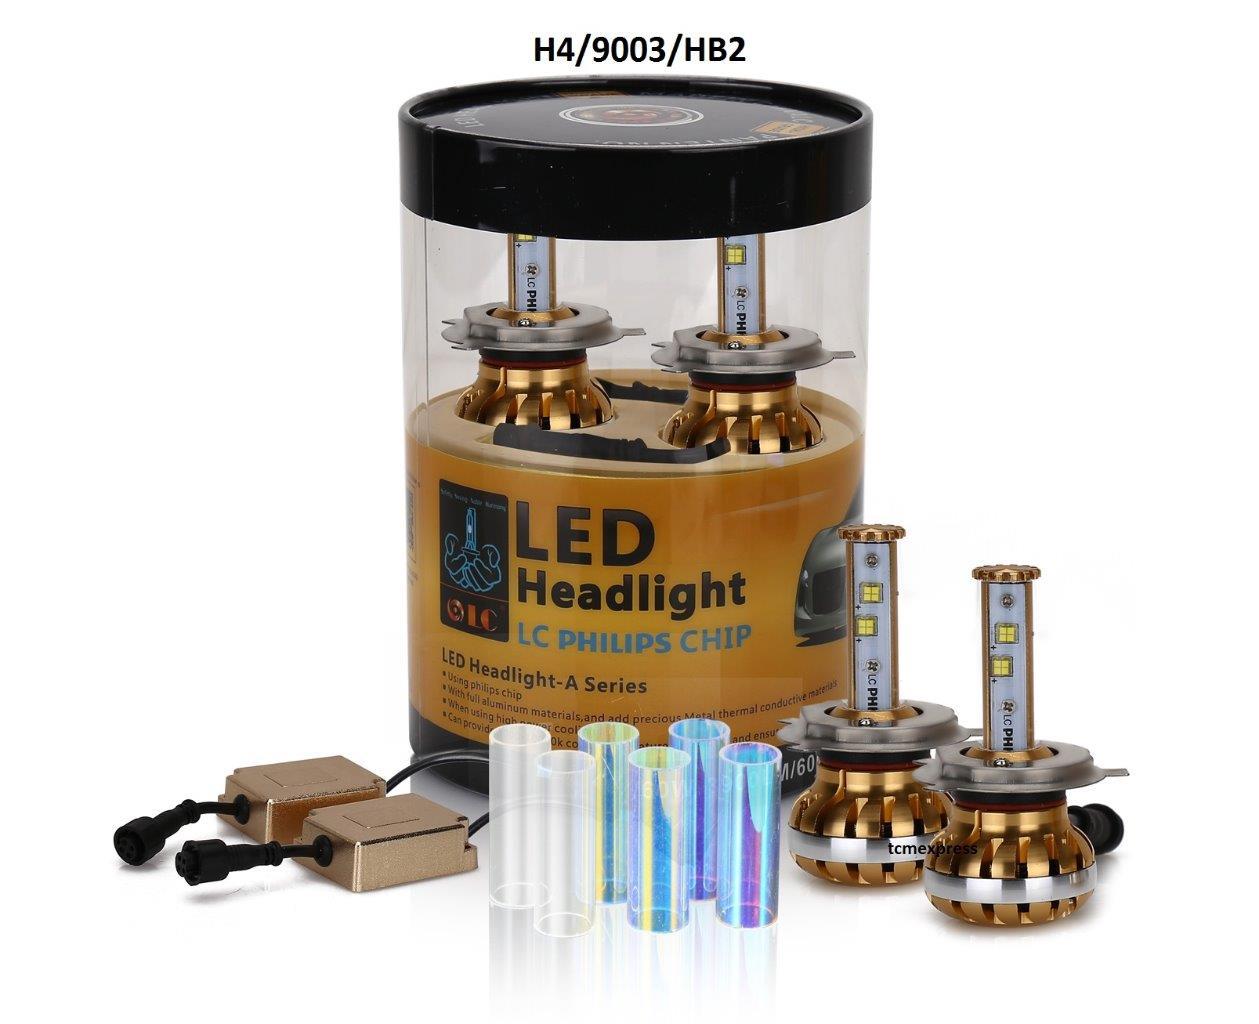 diy 3 colors philips led headlight kit bulb h4 9003 9007 h13 h11 h7 h8 9005 9006 ebay. Black Bedroom Furniture Sets. Home Design Ideas